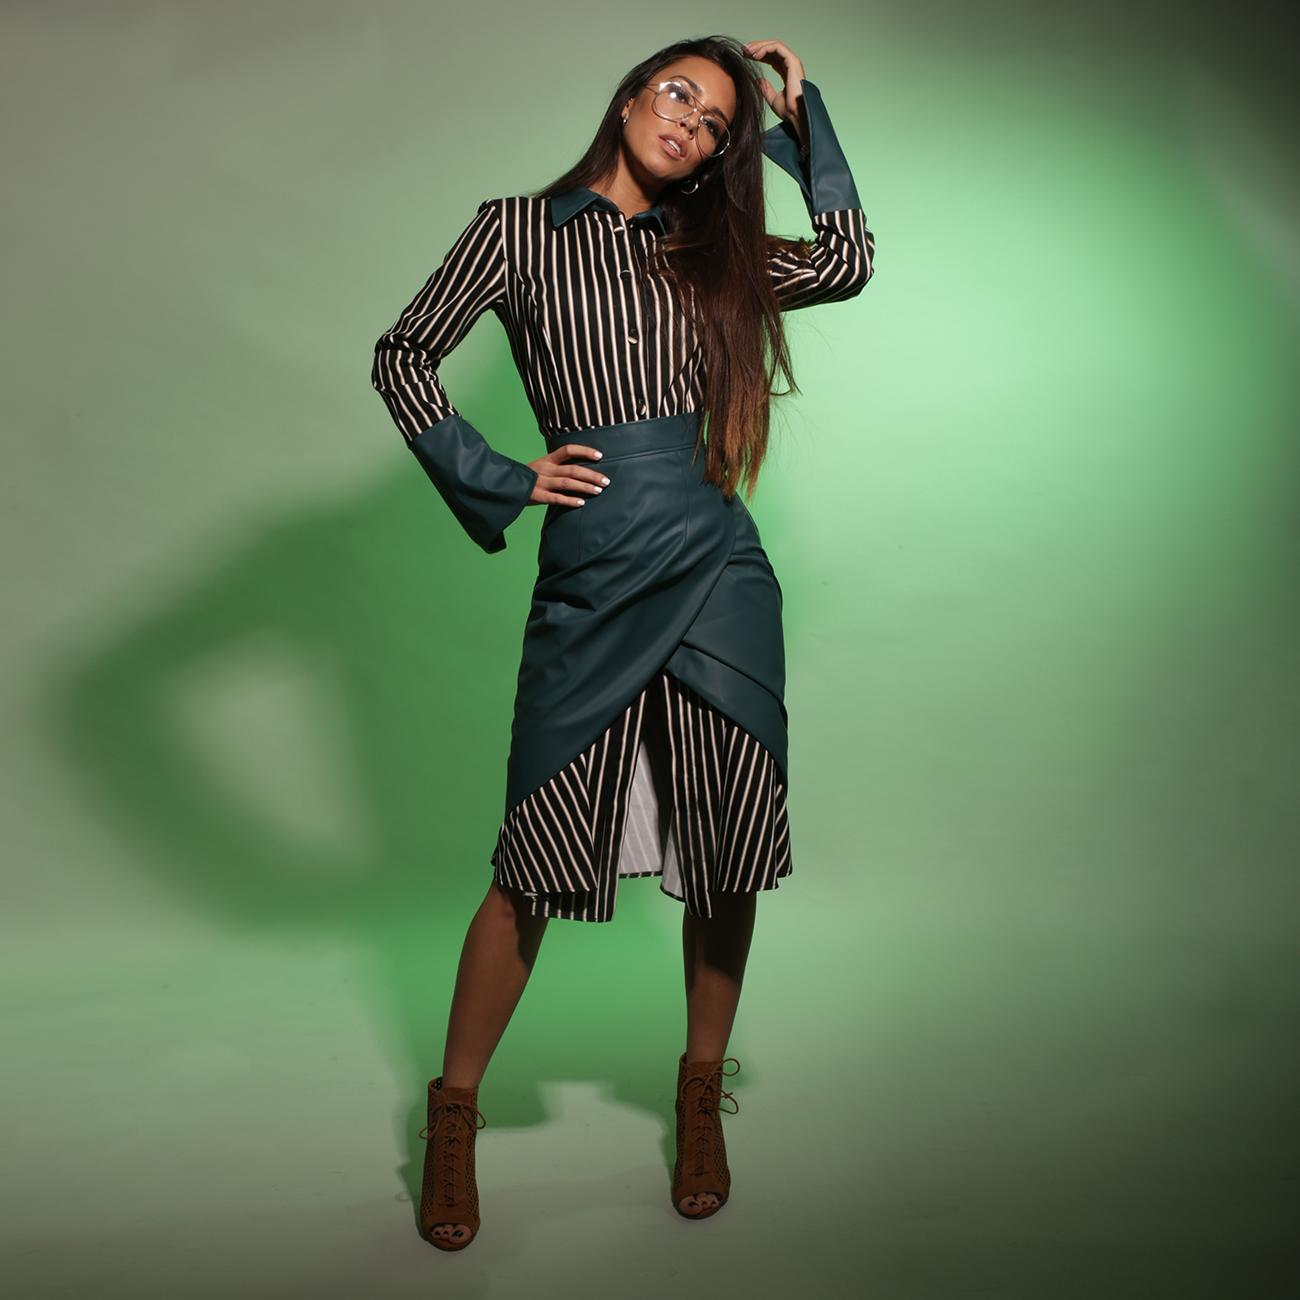 IMG 2725 NINAMILÀN studio: Attitude Is The New Black!